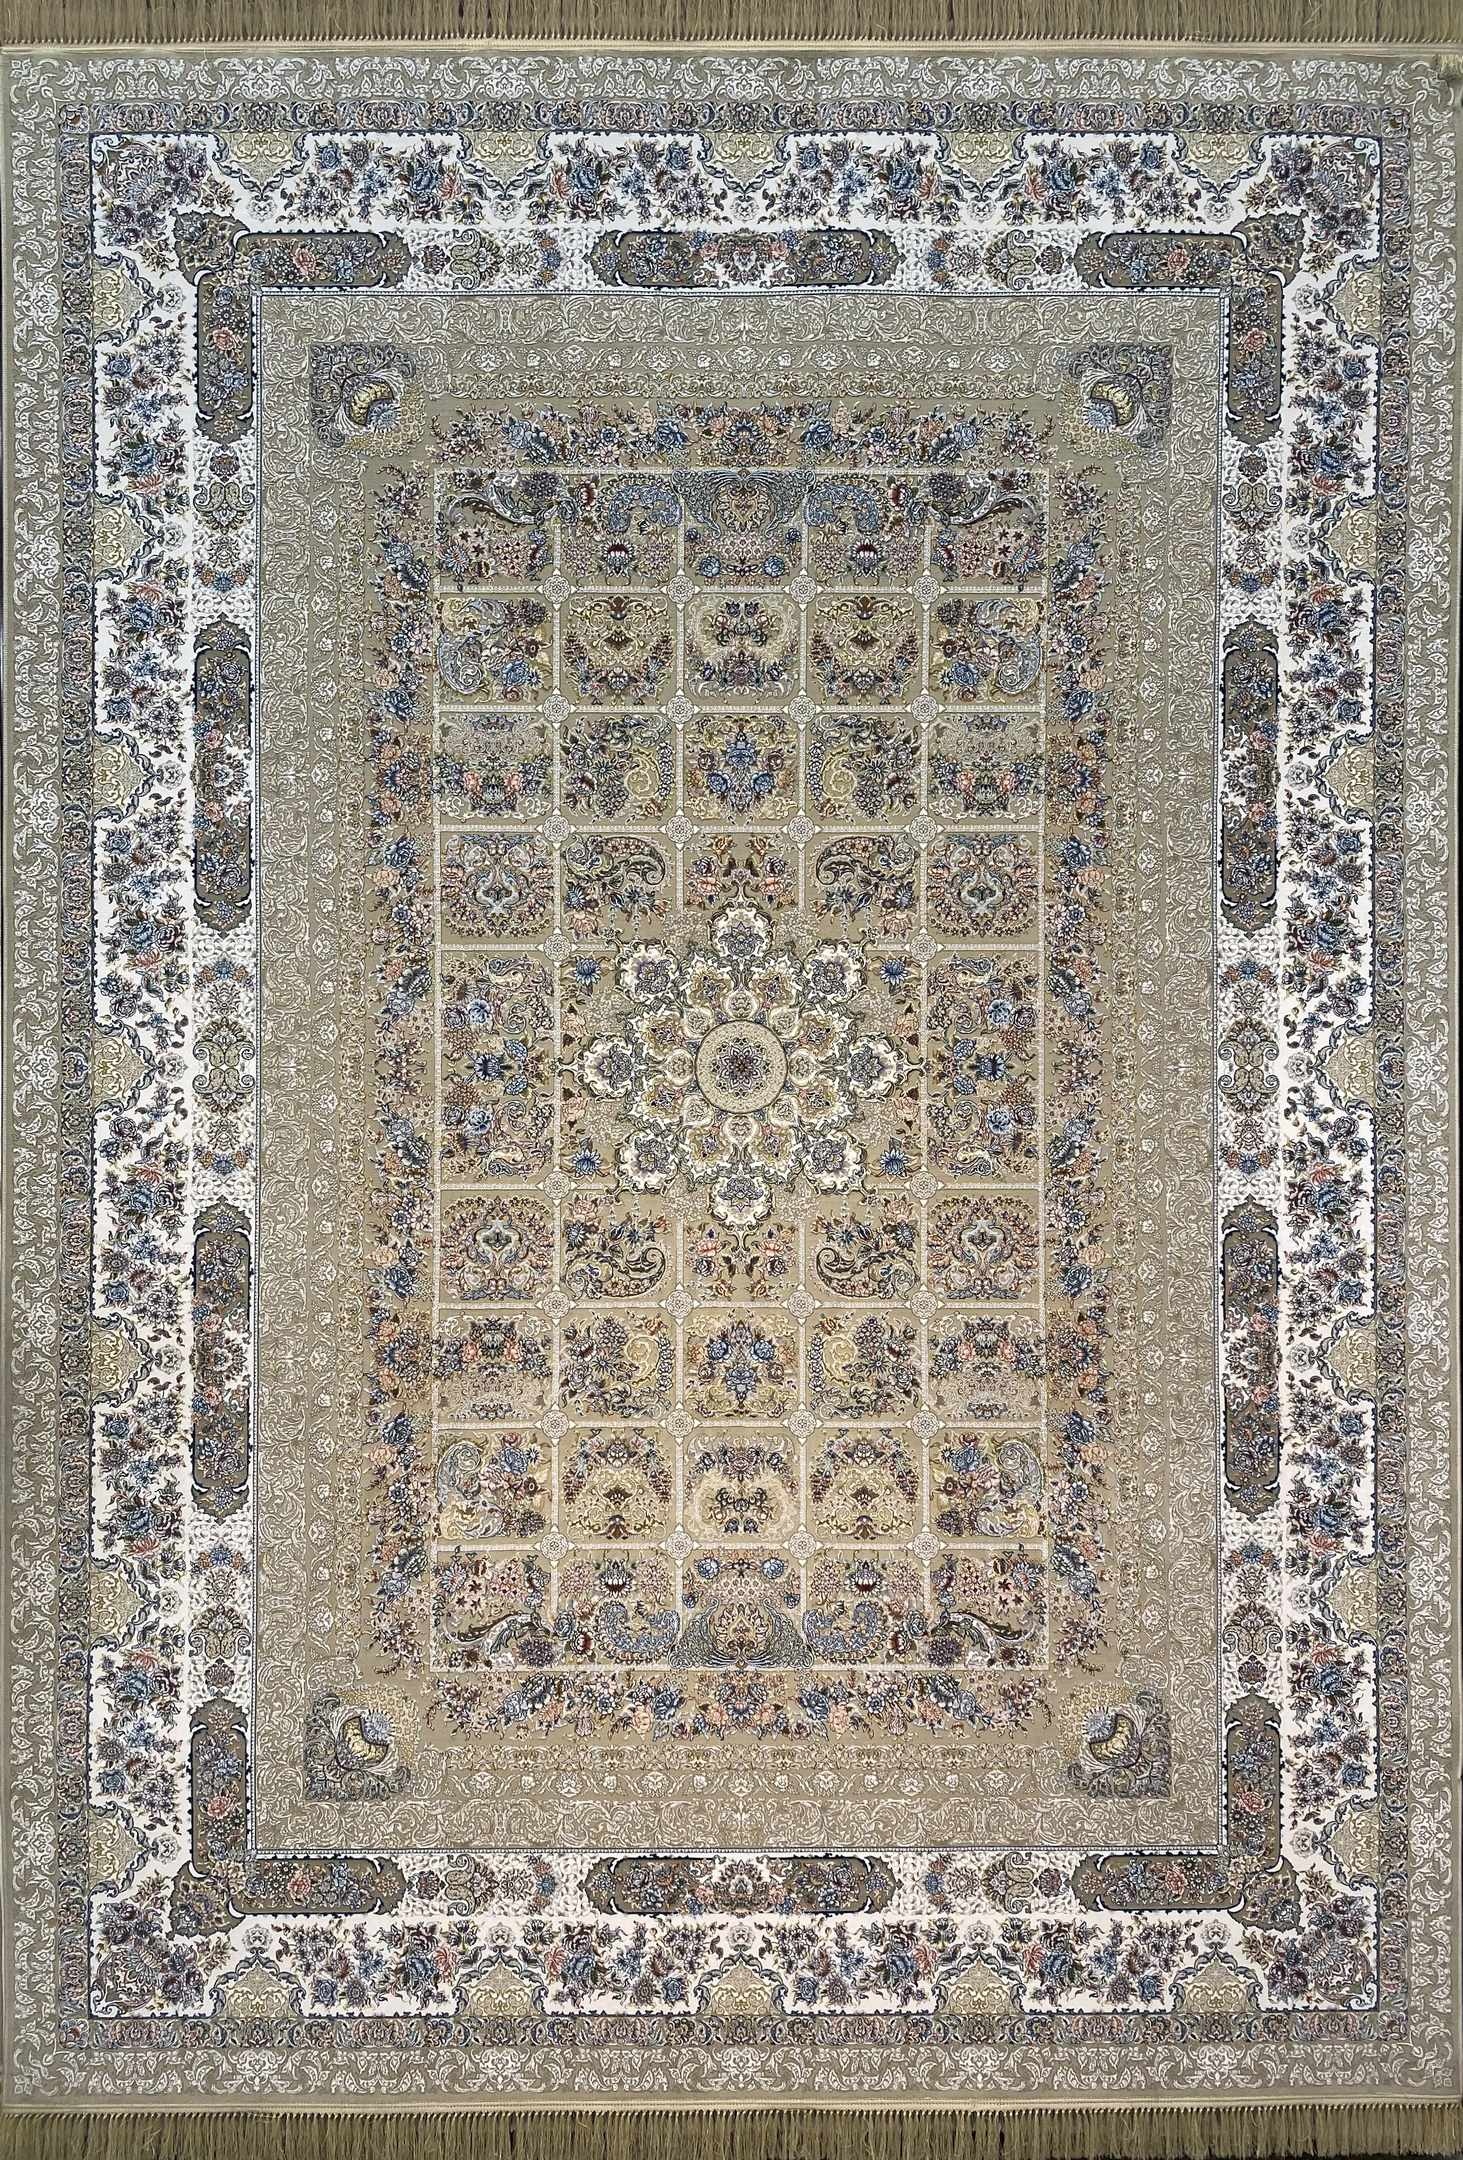 فرش کاشان – 1200 شانه برجسته خاتون